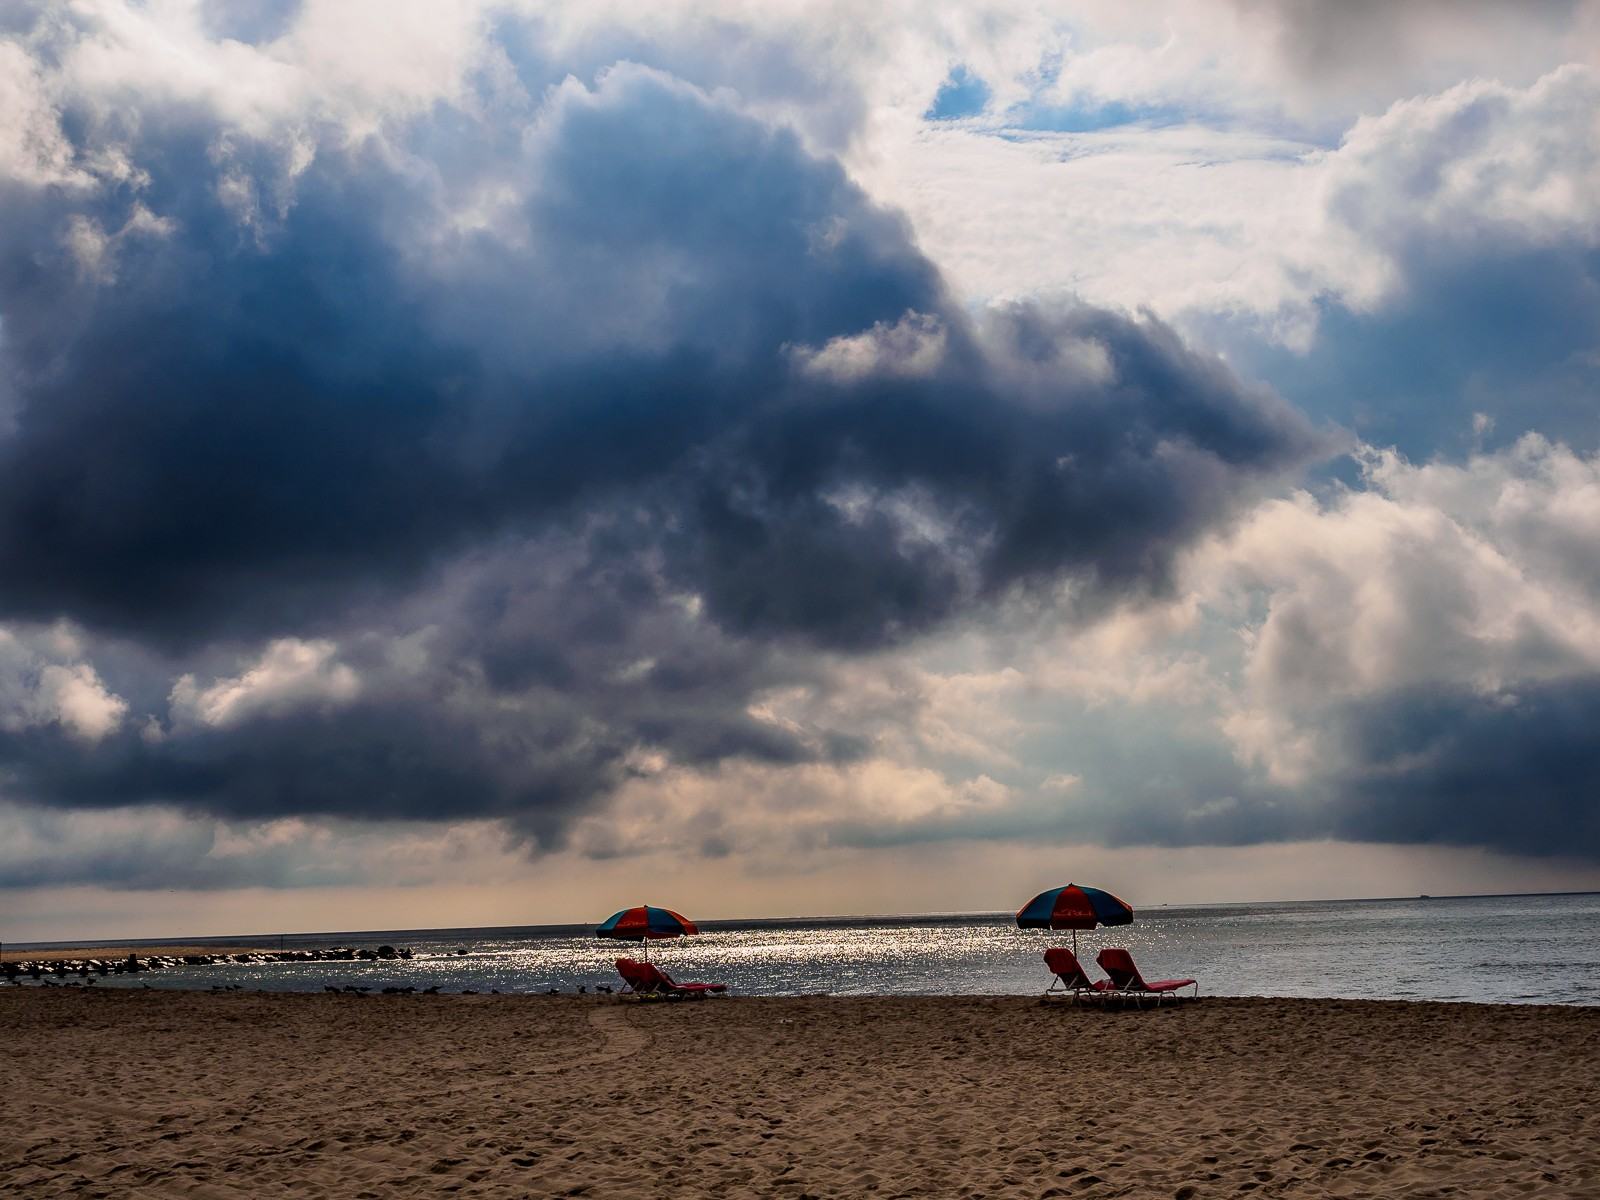 cape-may-beach-7333